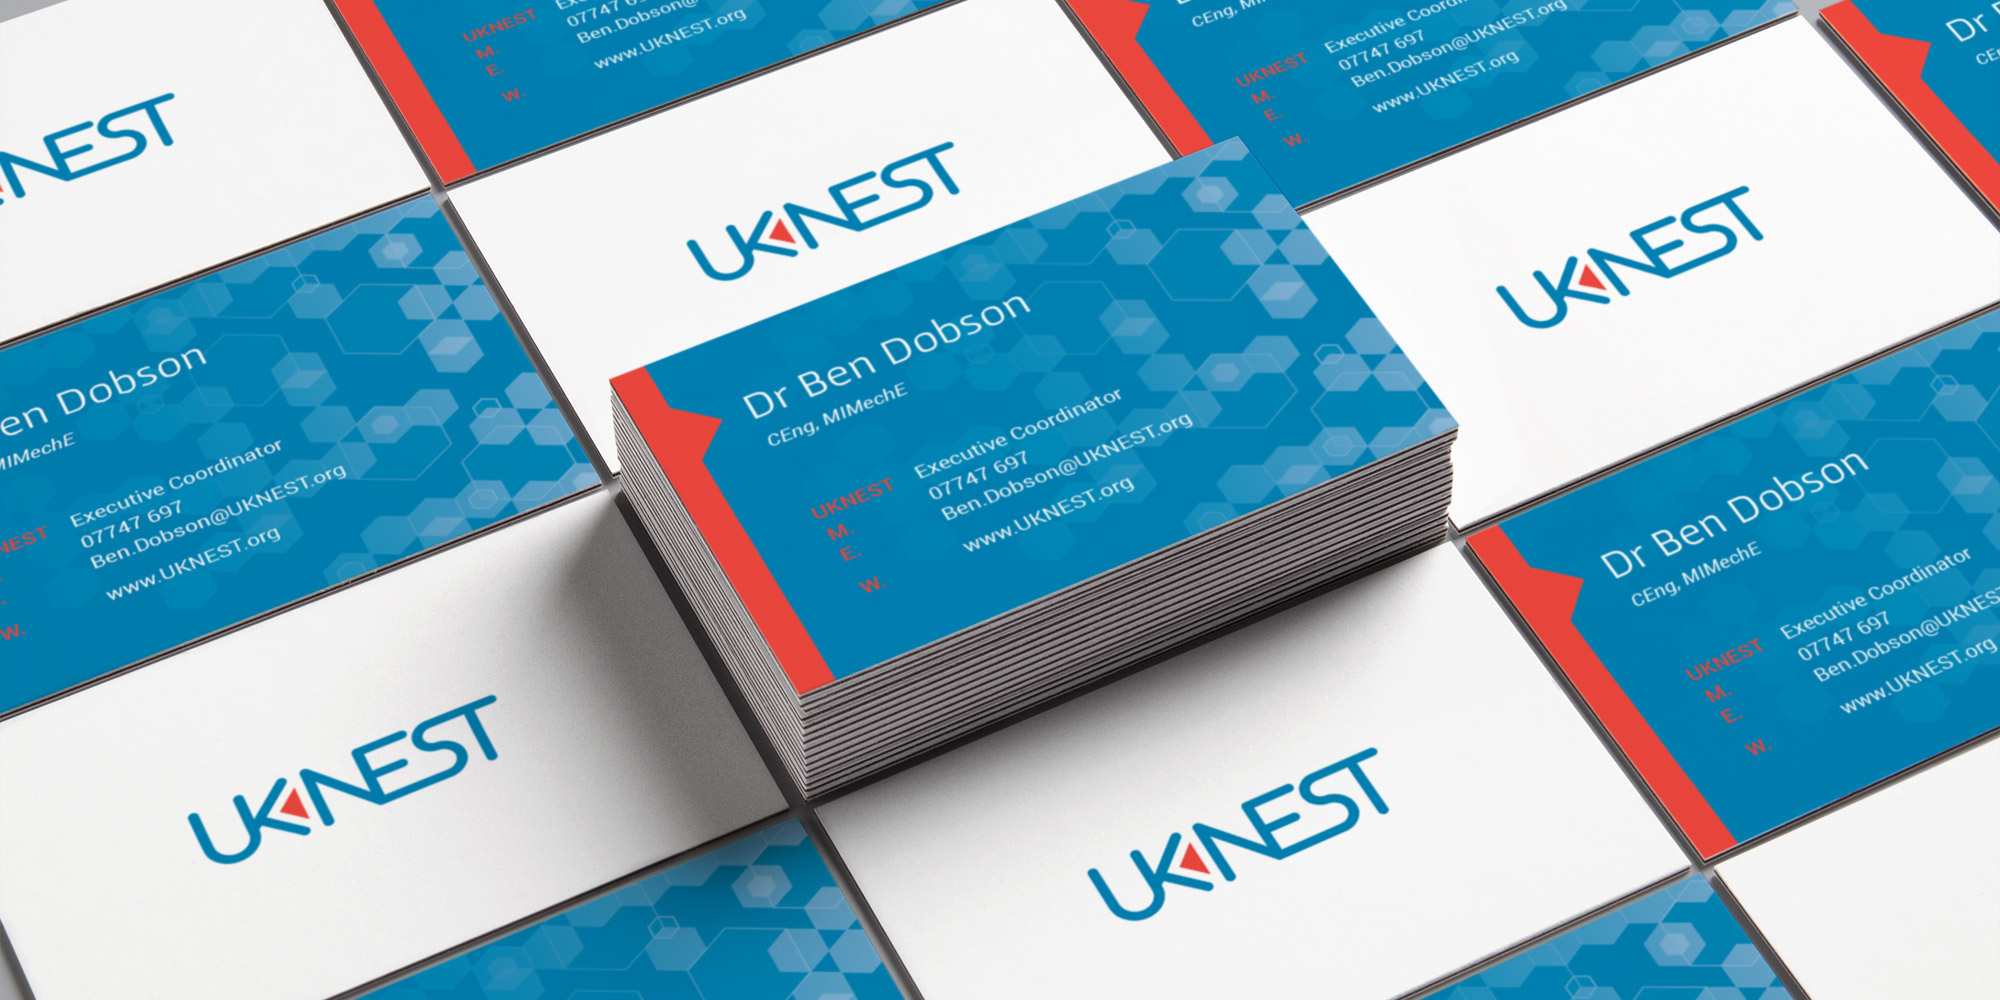 UK Nest Business Card Design